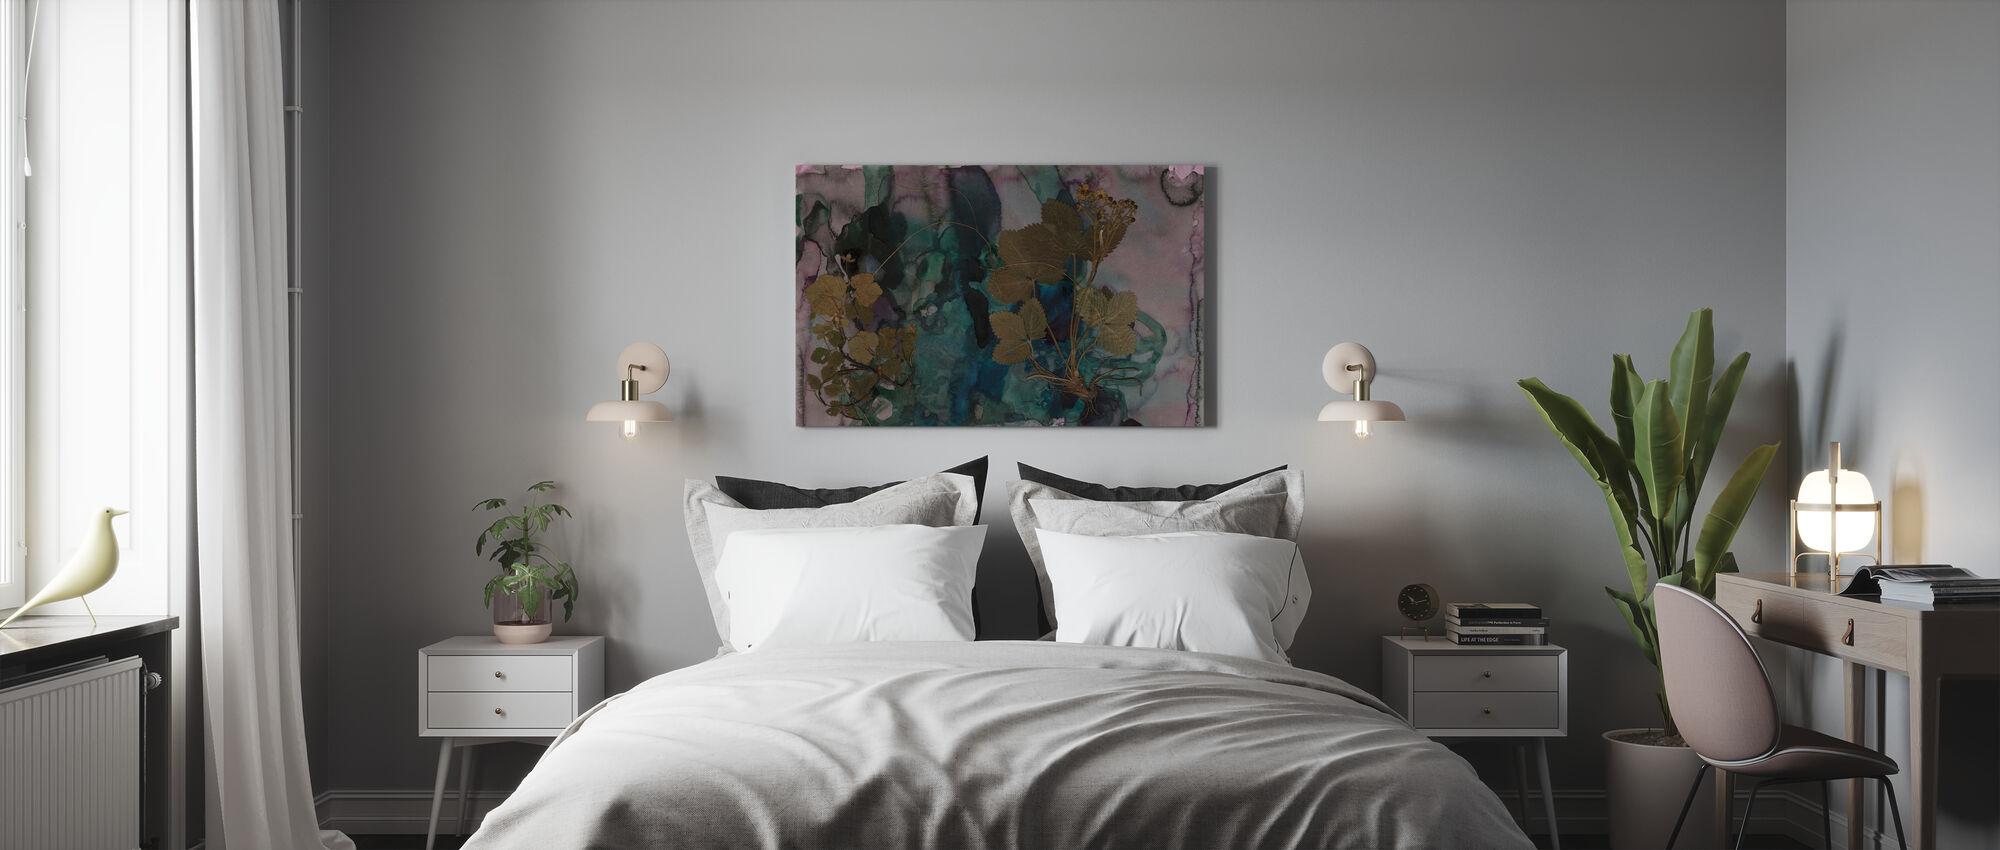 Aardbeien - Canvas print - Slaapkamer